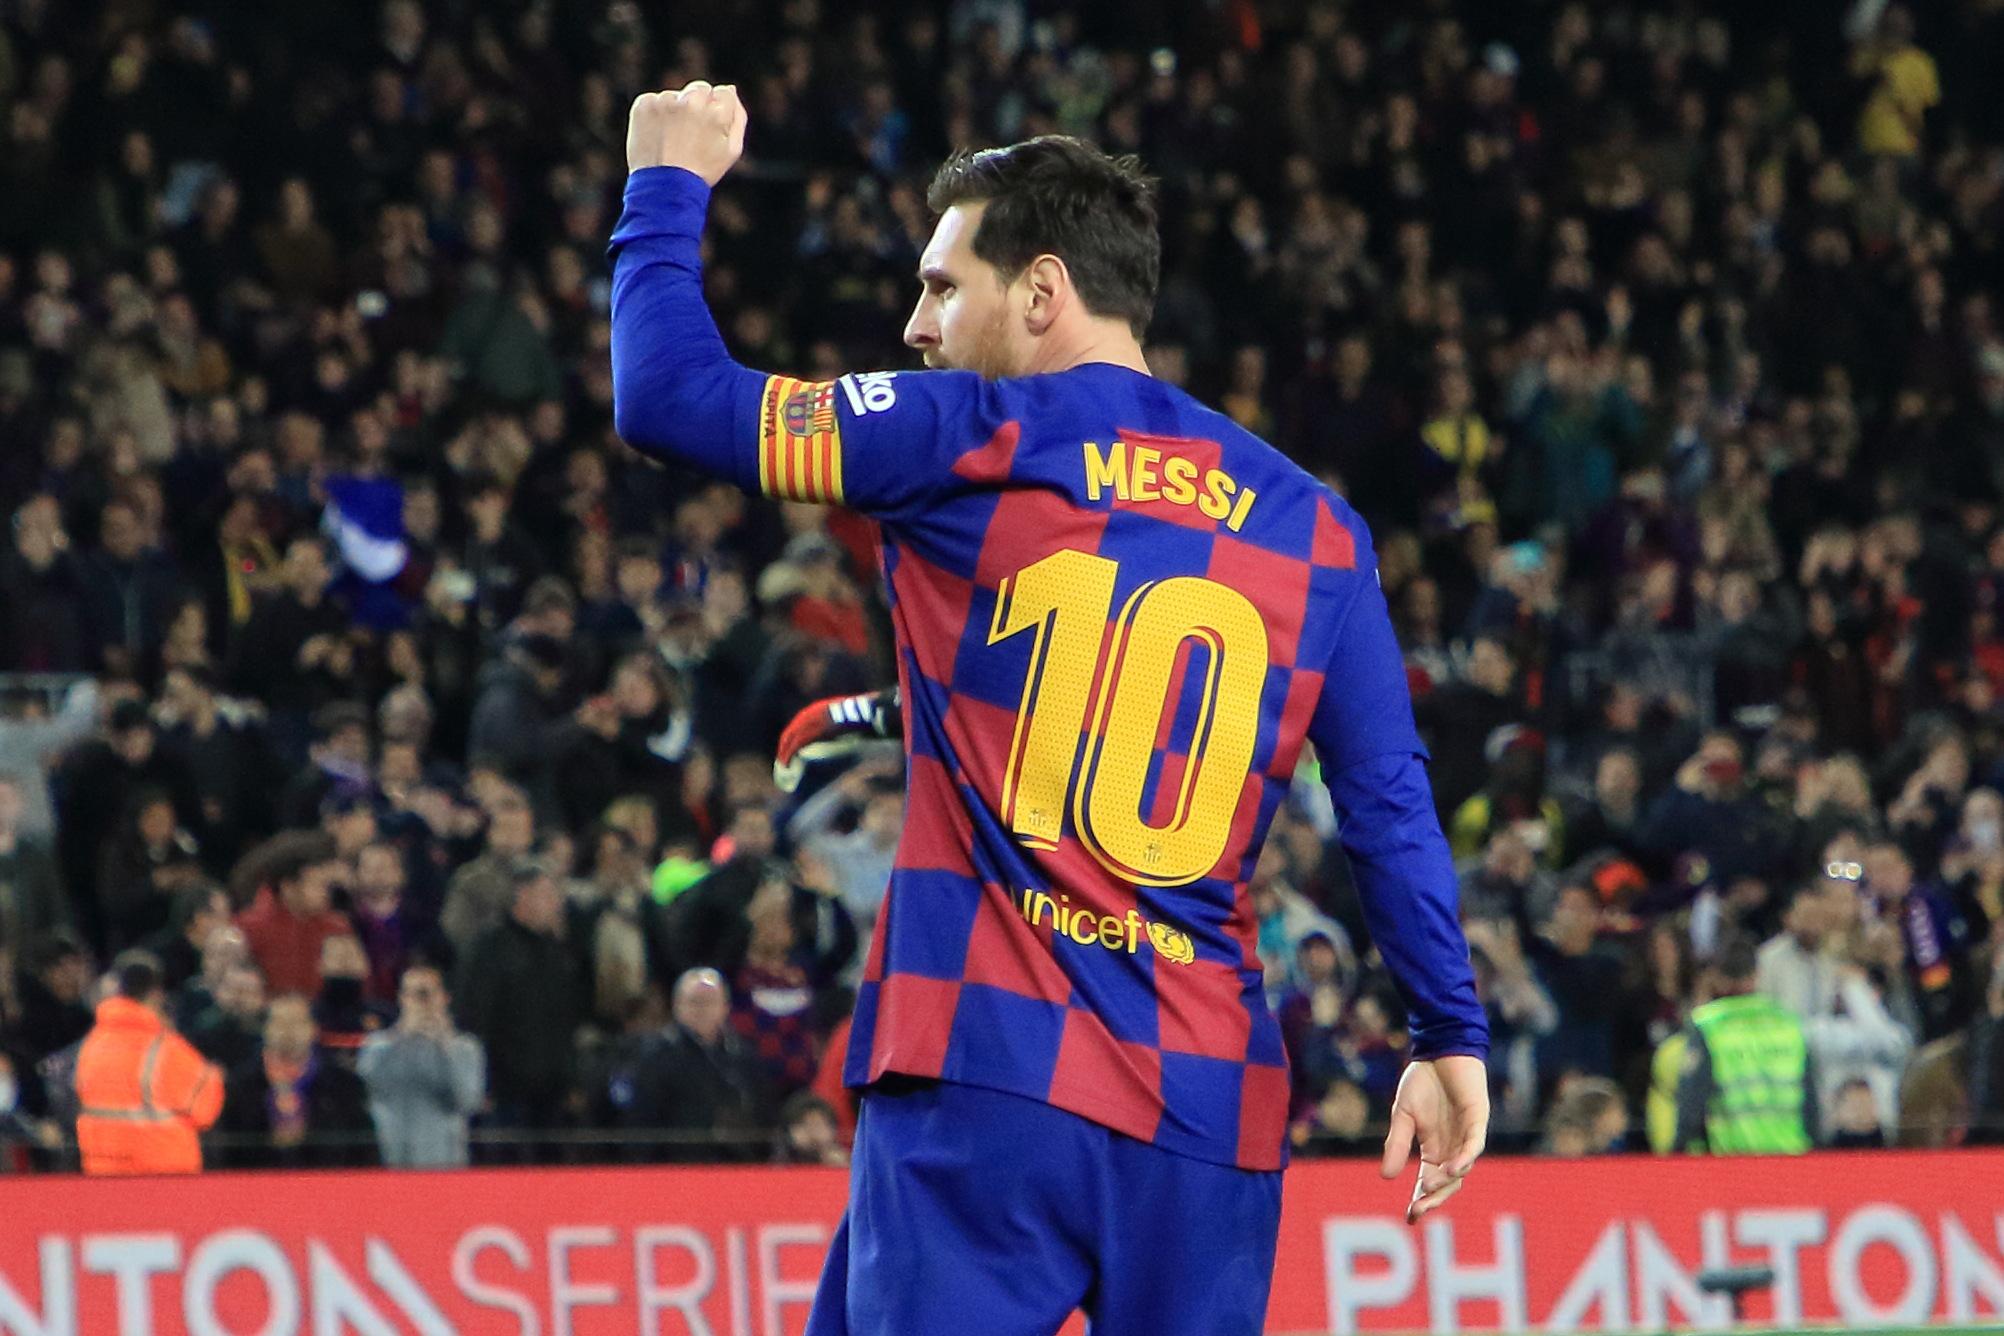 Lionel Messi's 4-goal 'poker'